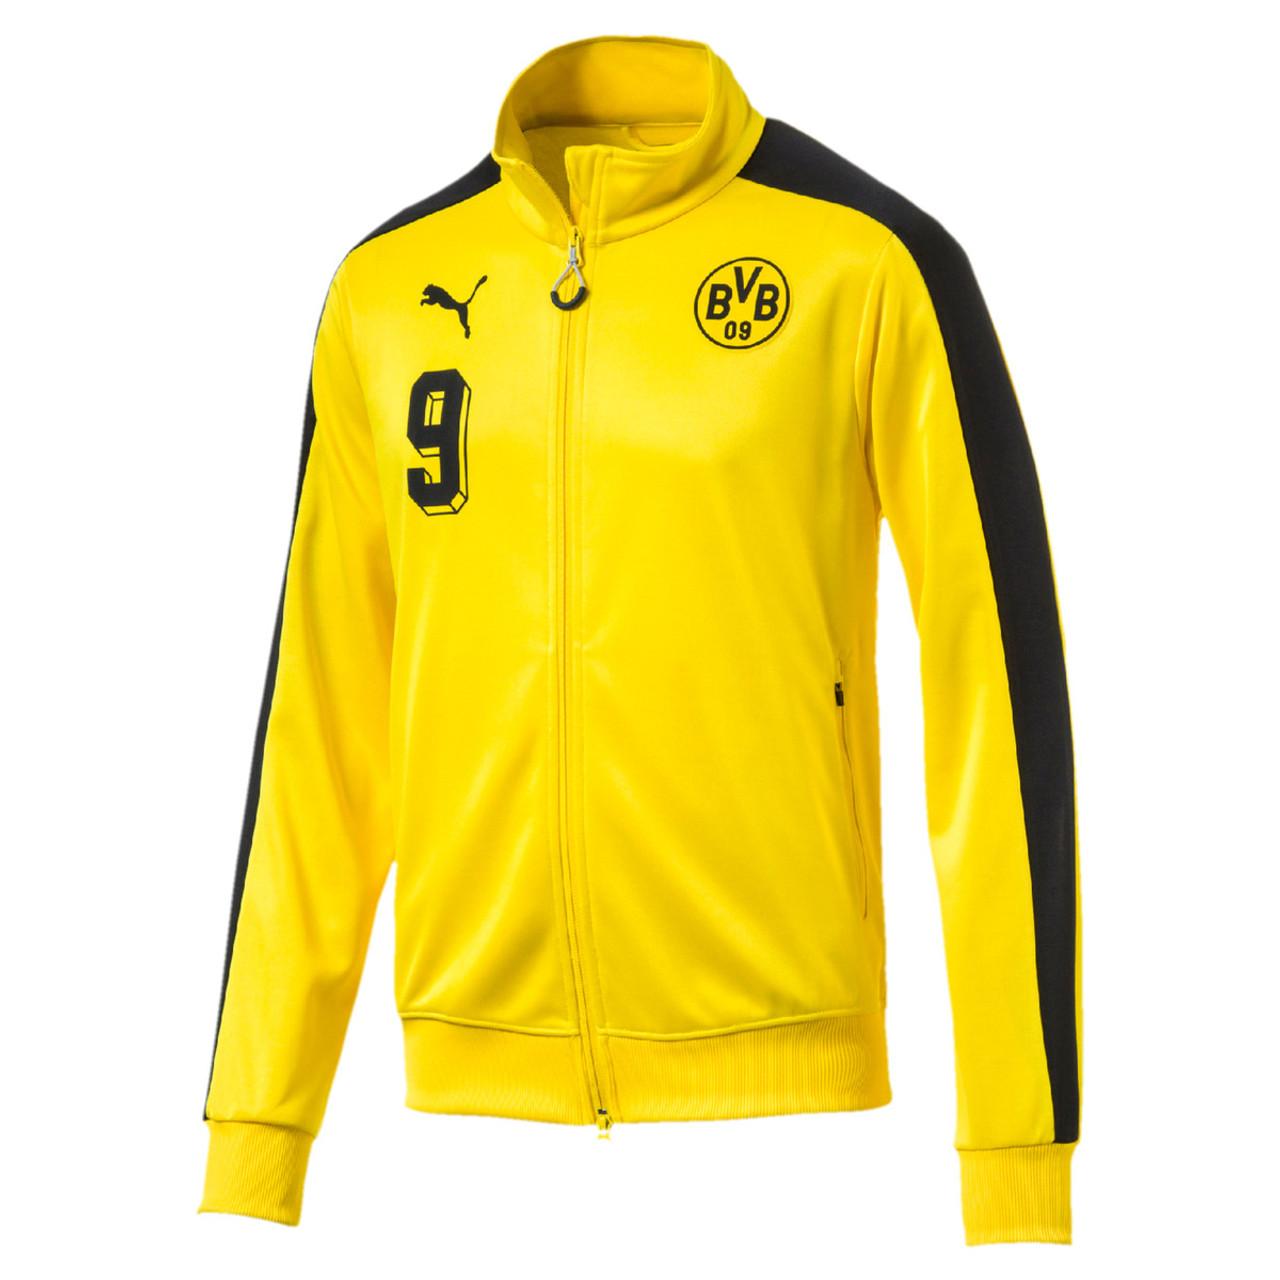 838b57ec729b PUMA BORUSSIA DORTMUND T7 JACKET Cyber Yellow - Soccer Plus